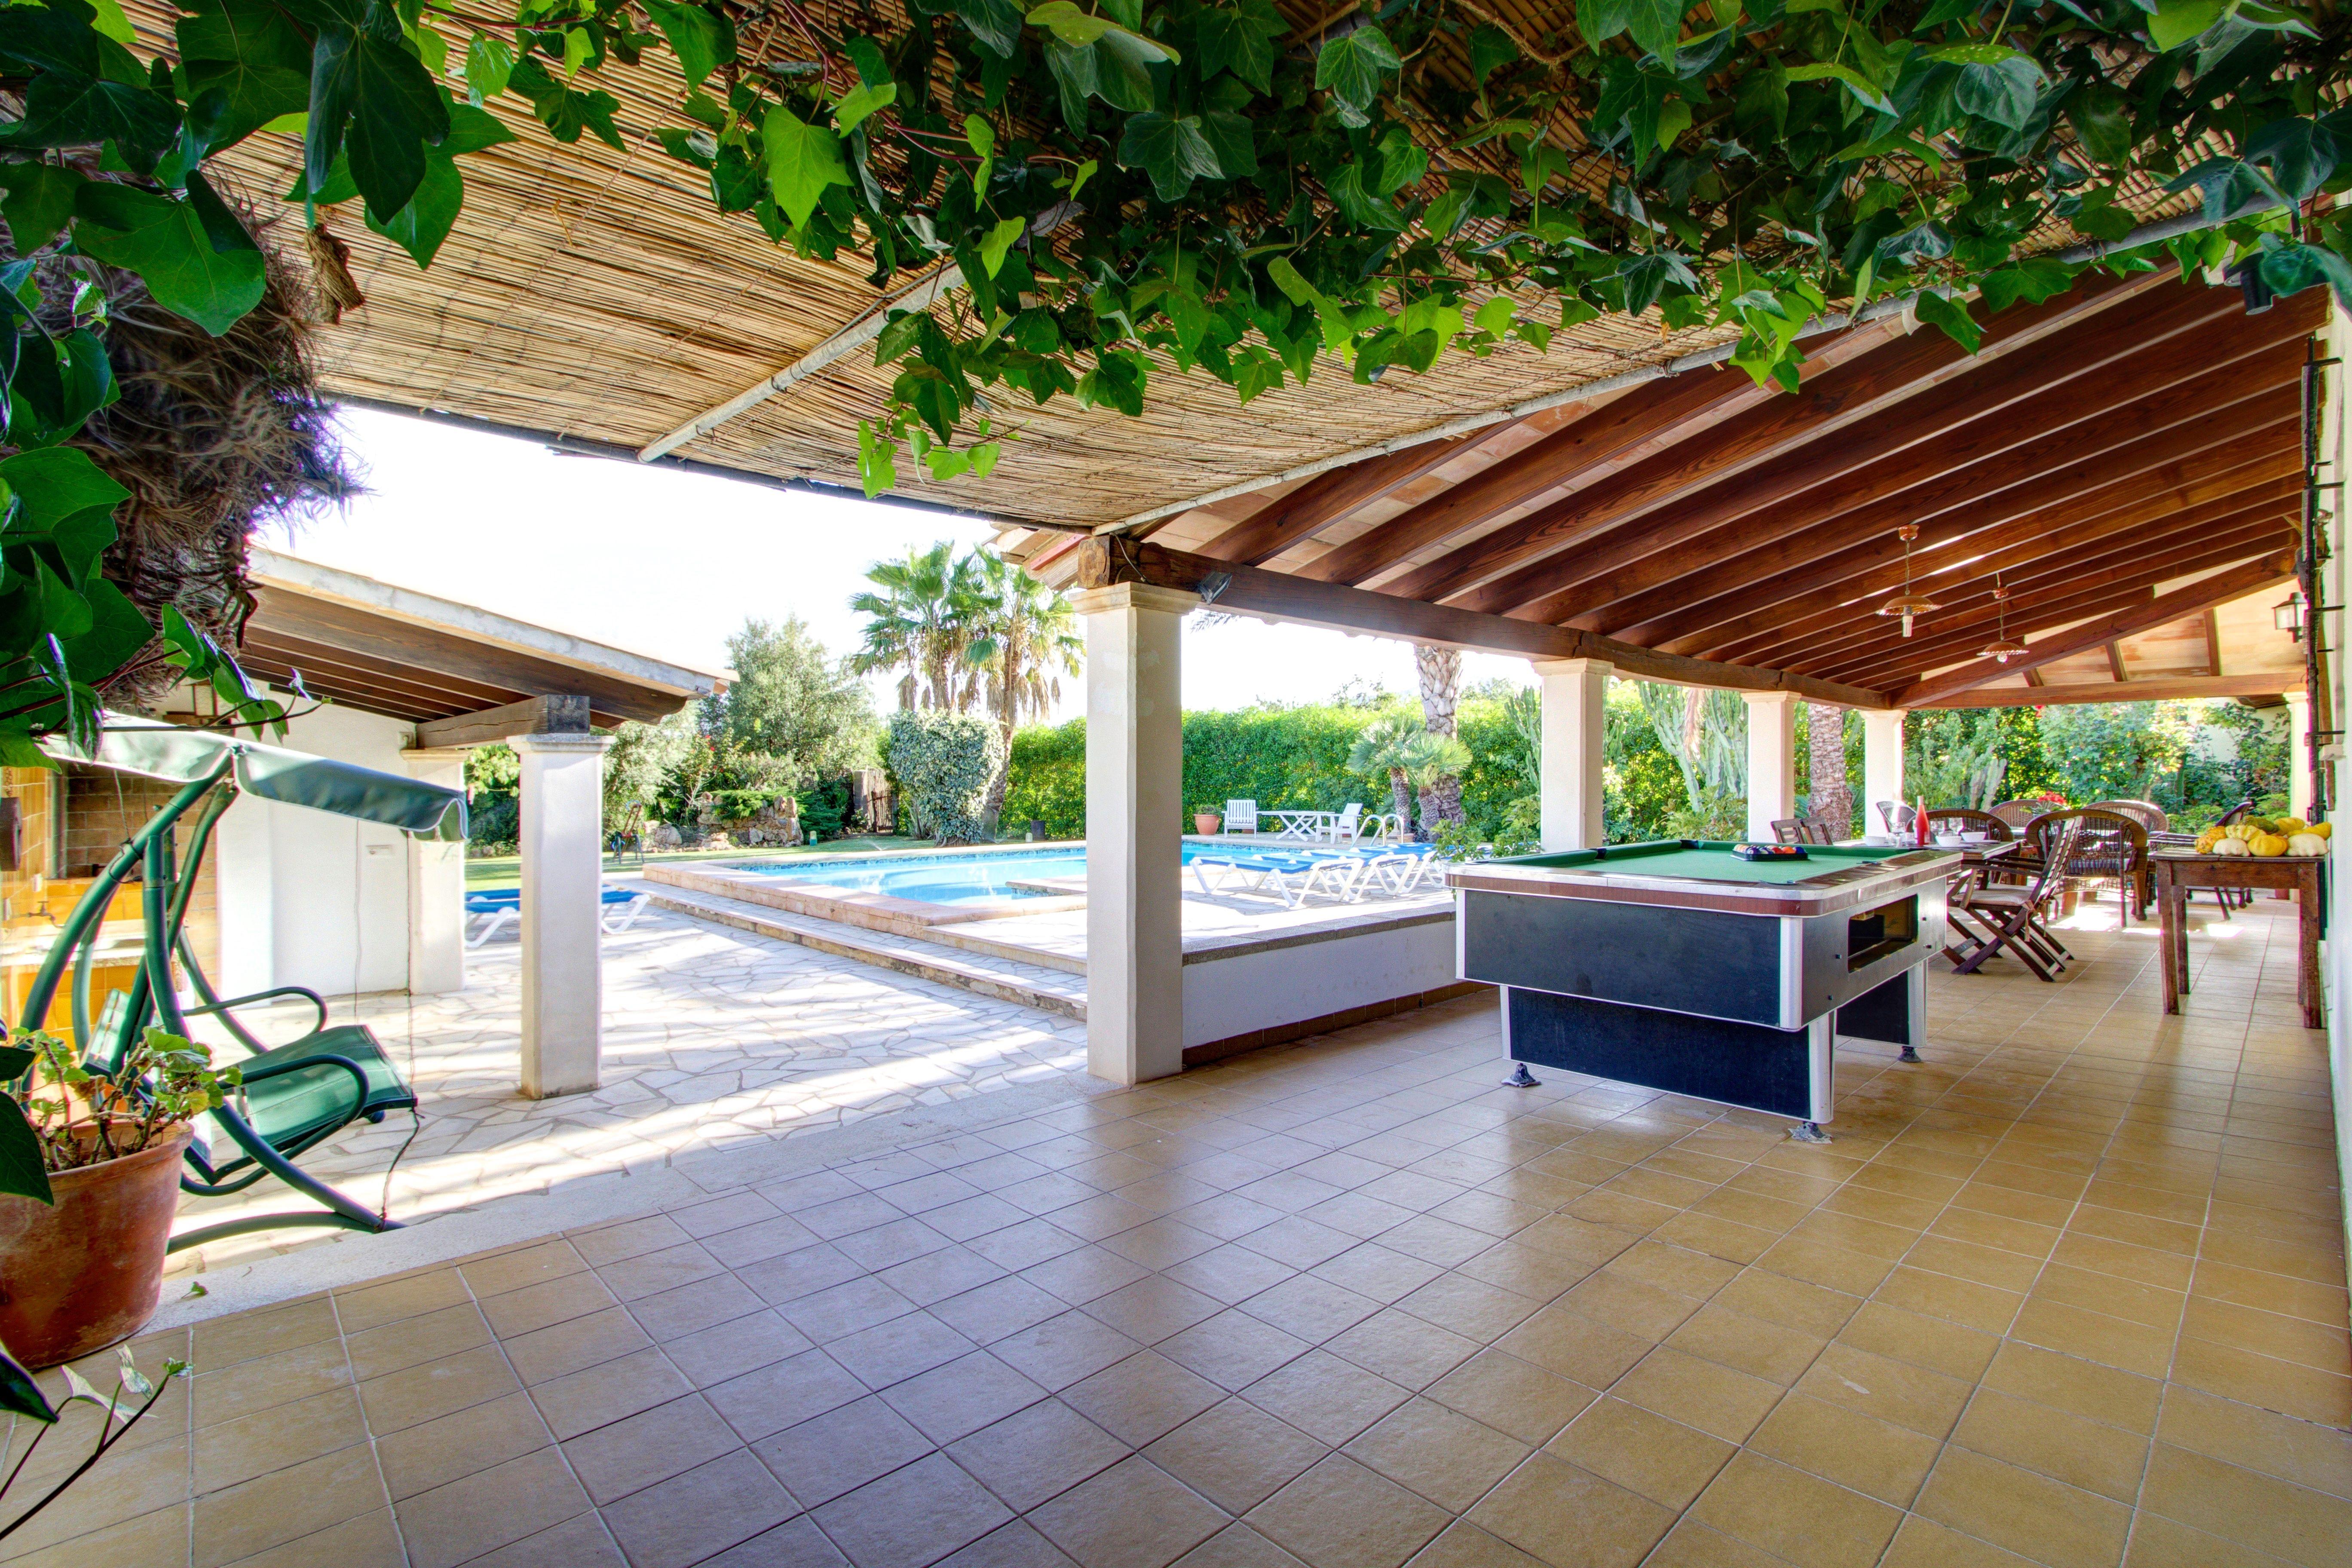 villas in mallorca Mallorca, Villas, Spain